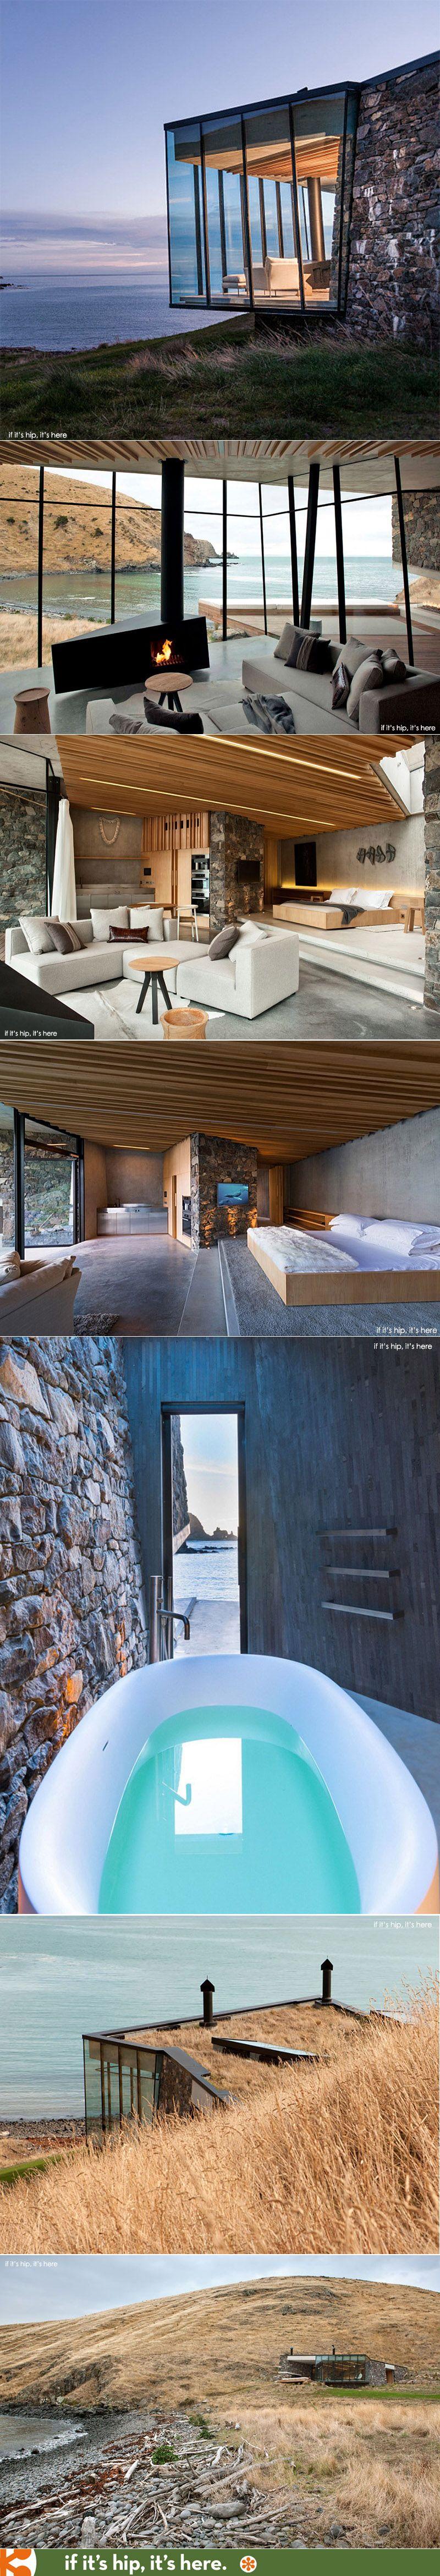 102 best Villas de prestige images on Pinterest